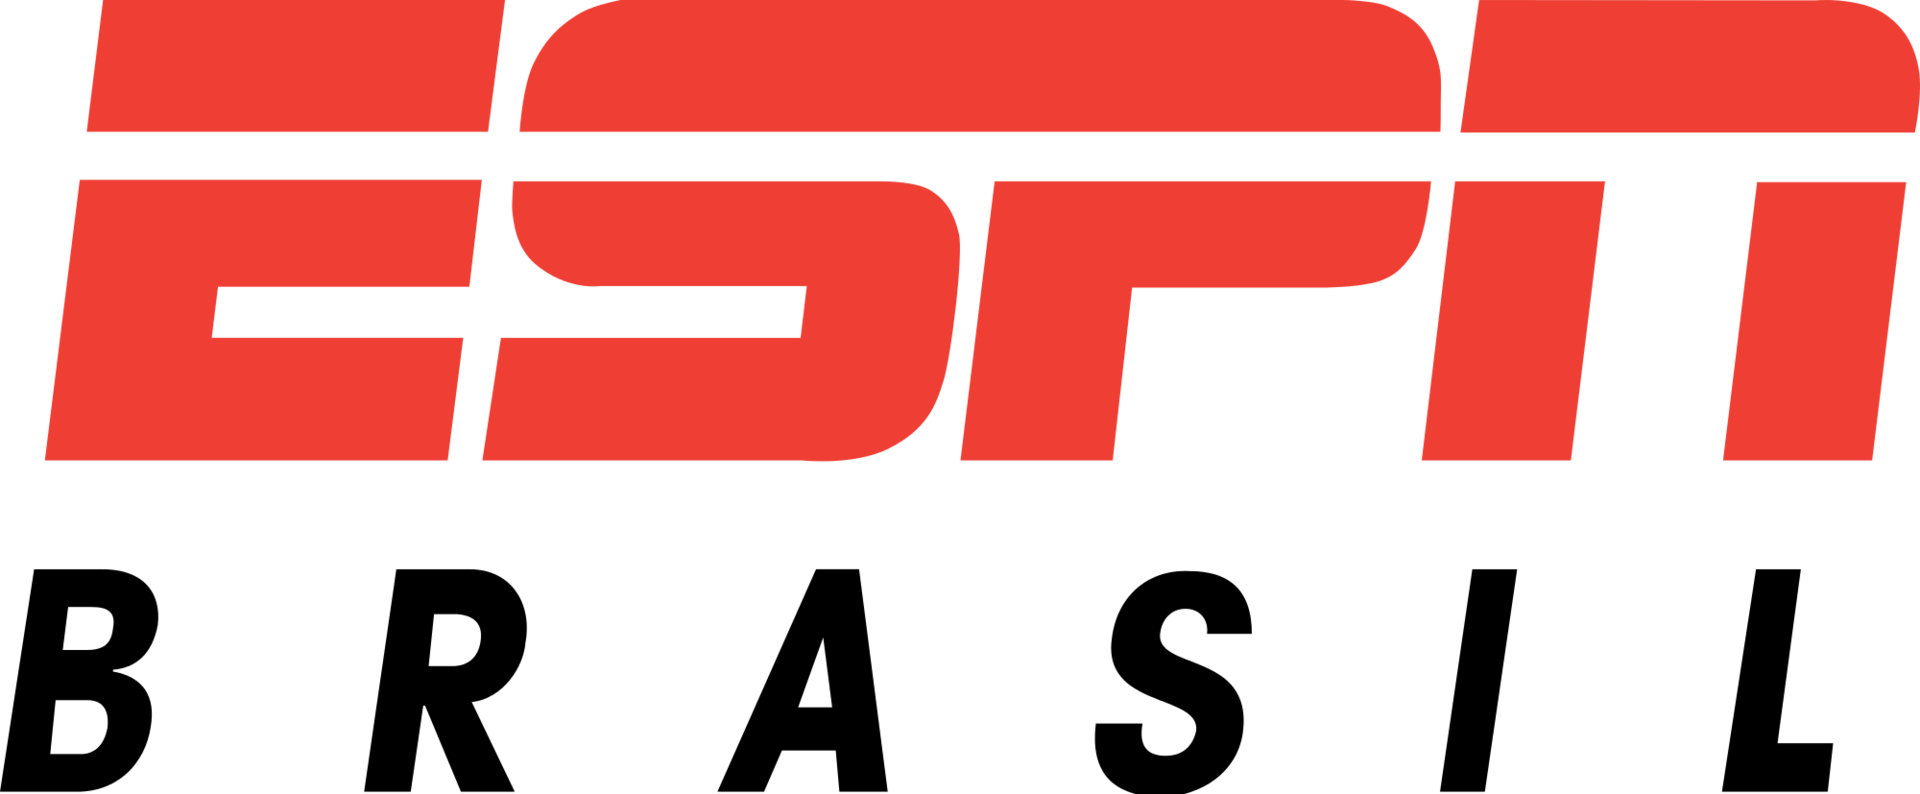 Logo espnbrasil.png